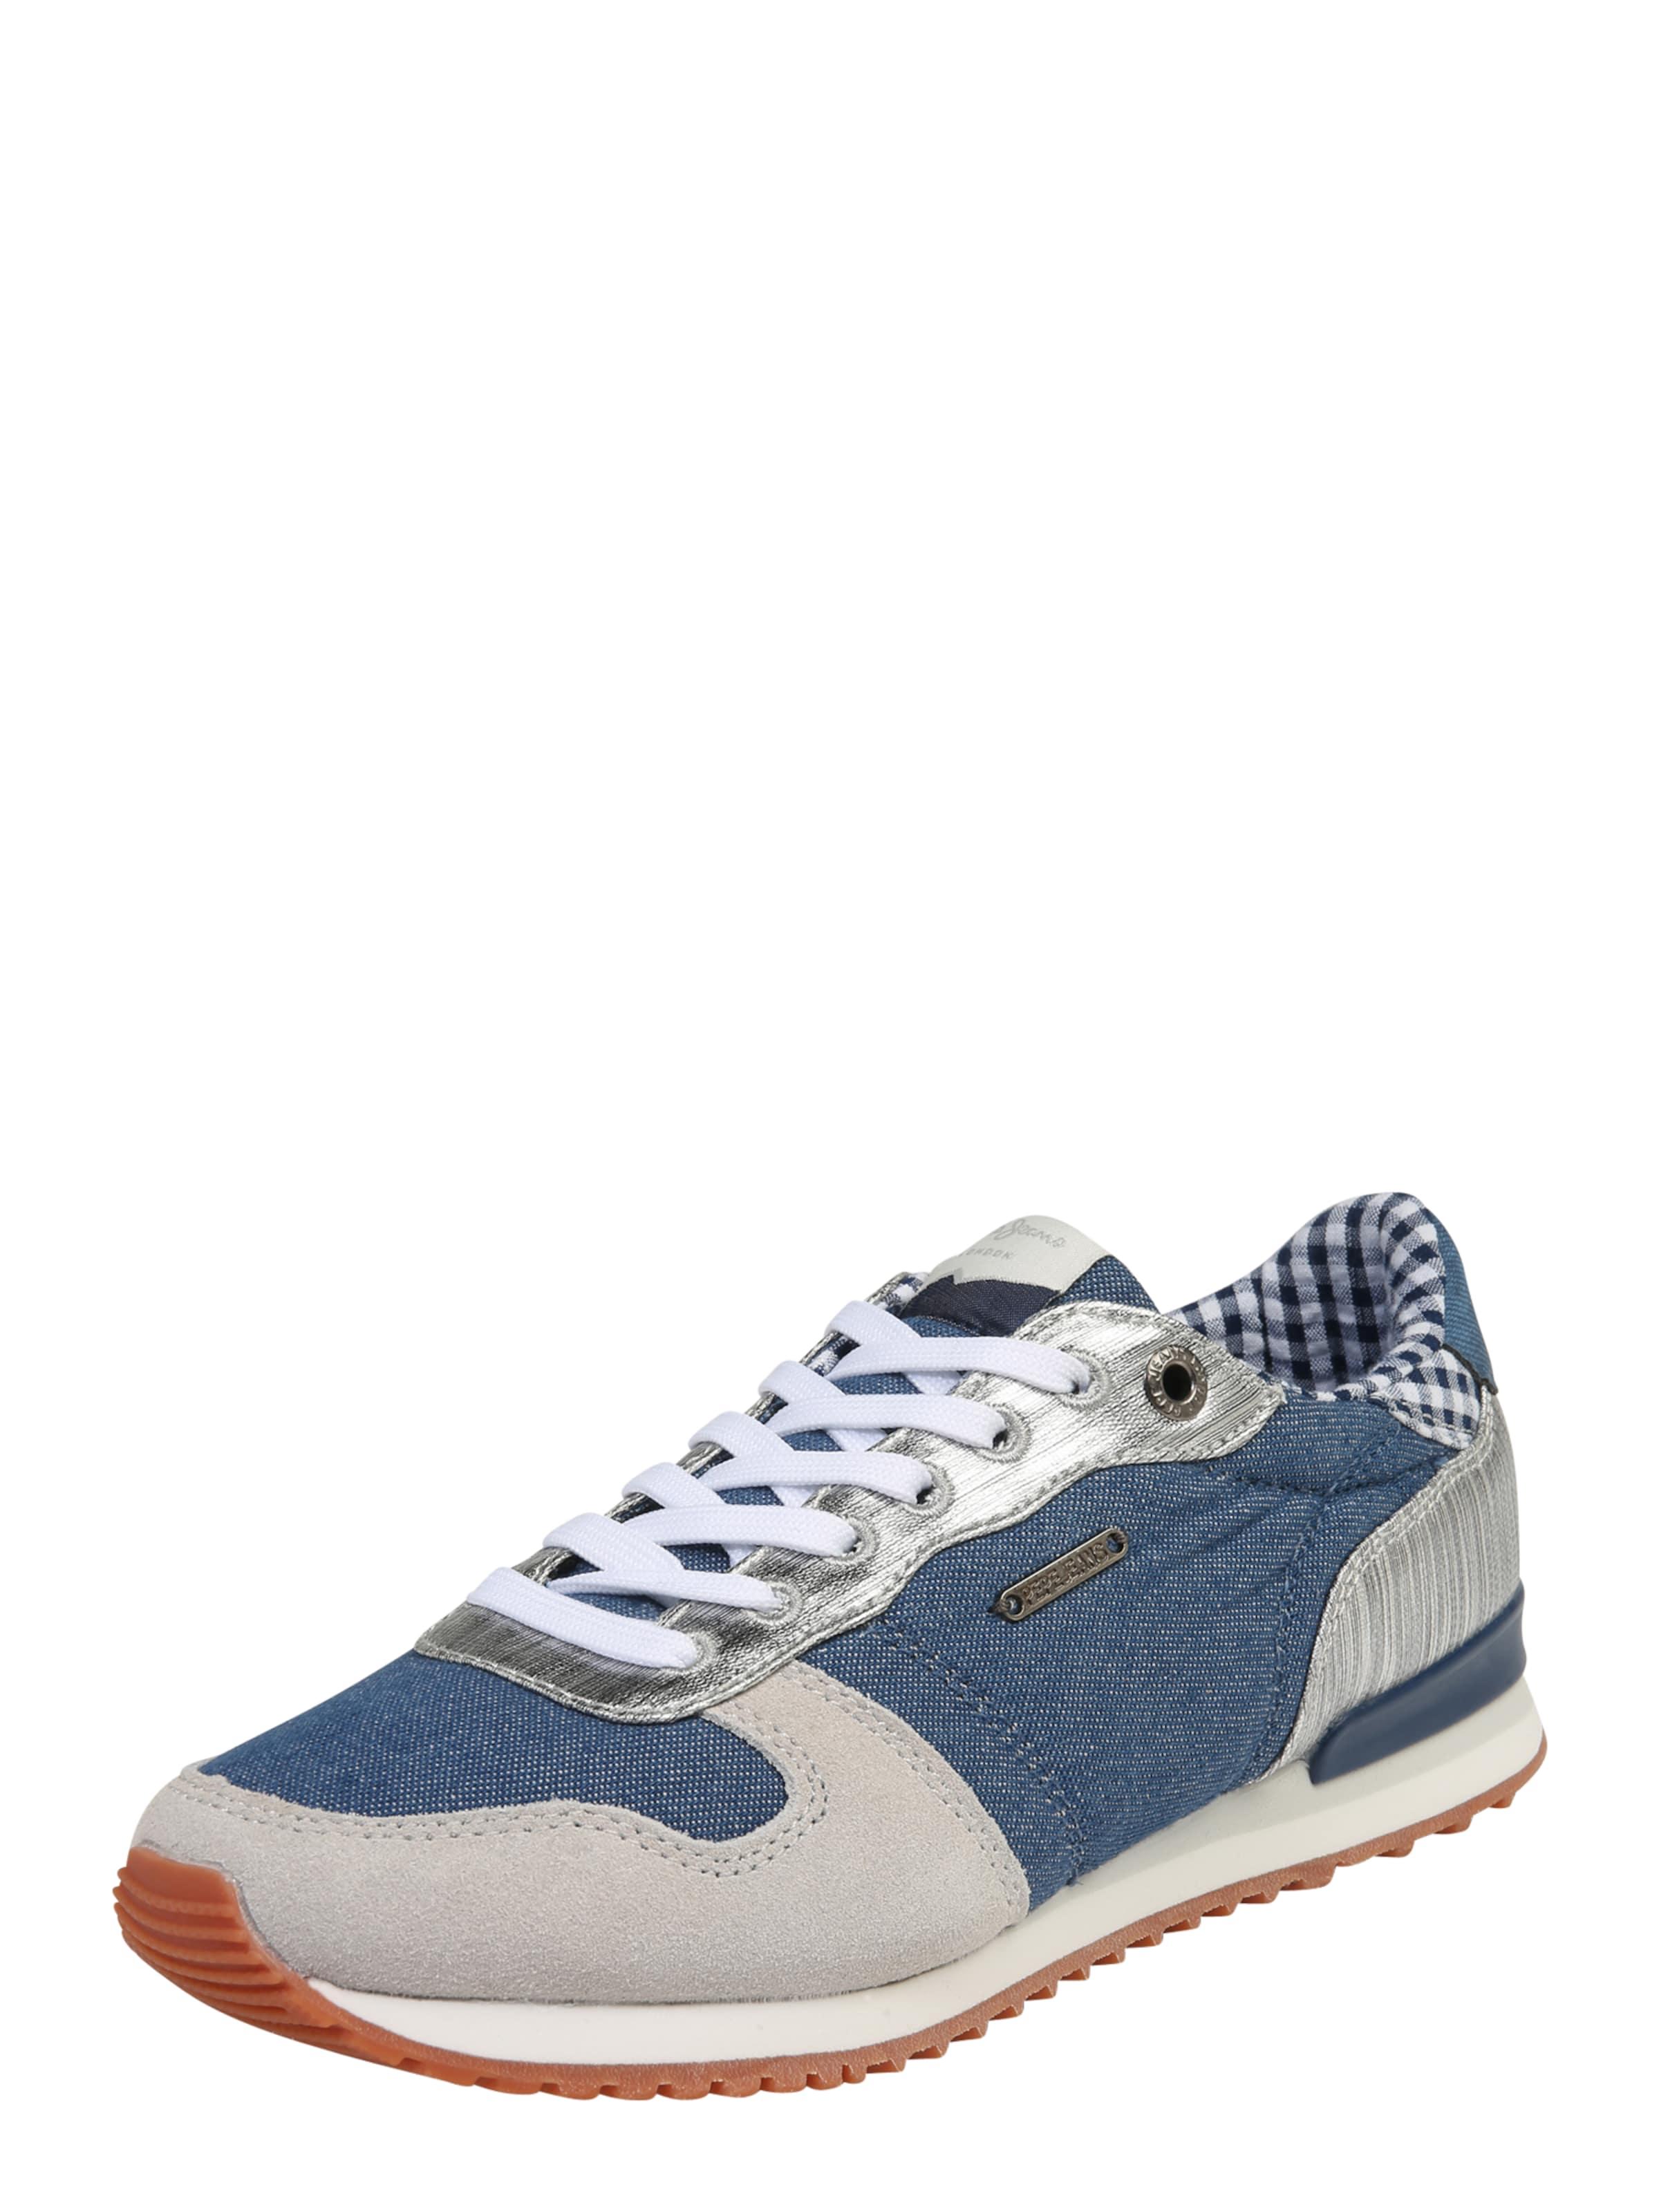 Pepe Jeans Sneaker 'GABLE SUE' Empfehlen Billig wiTxe